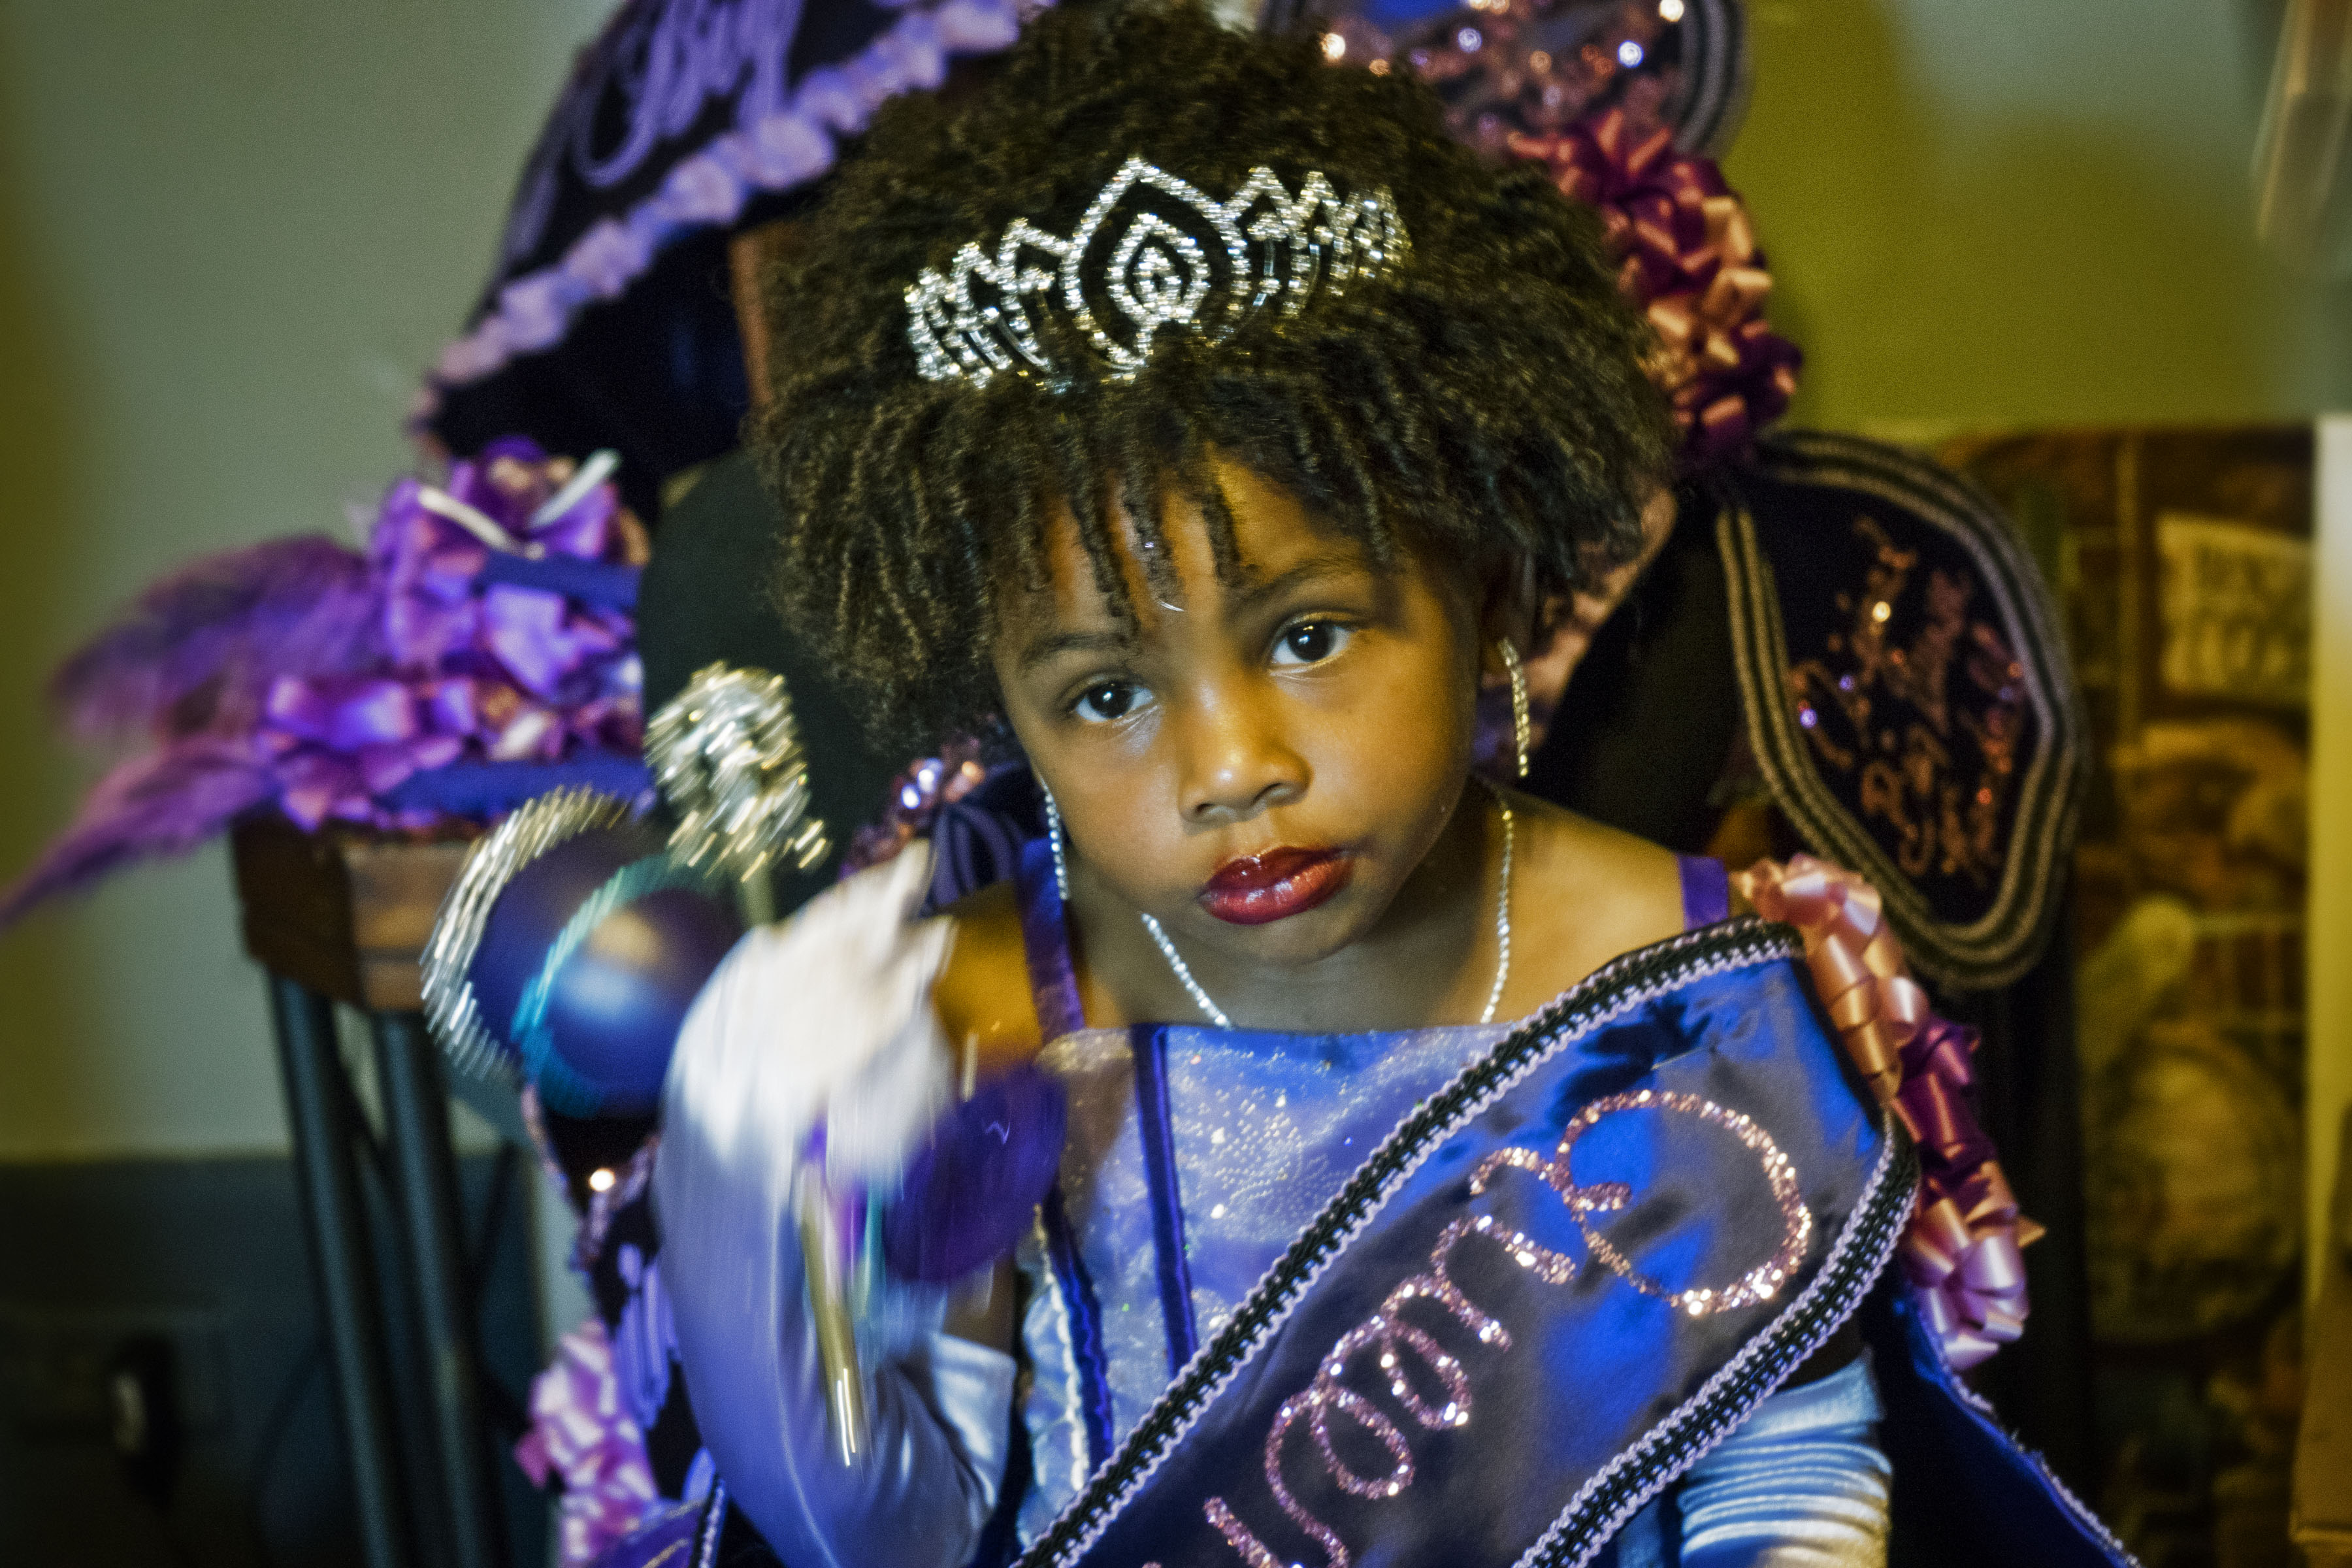 The princess of the parade.